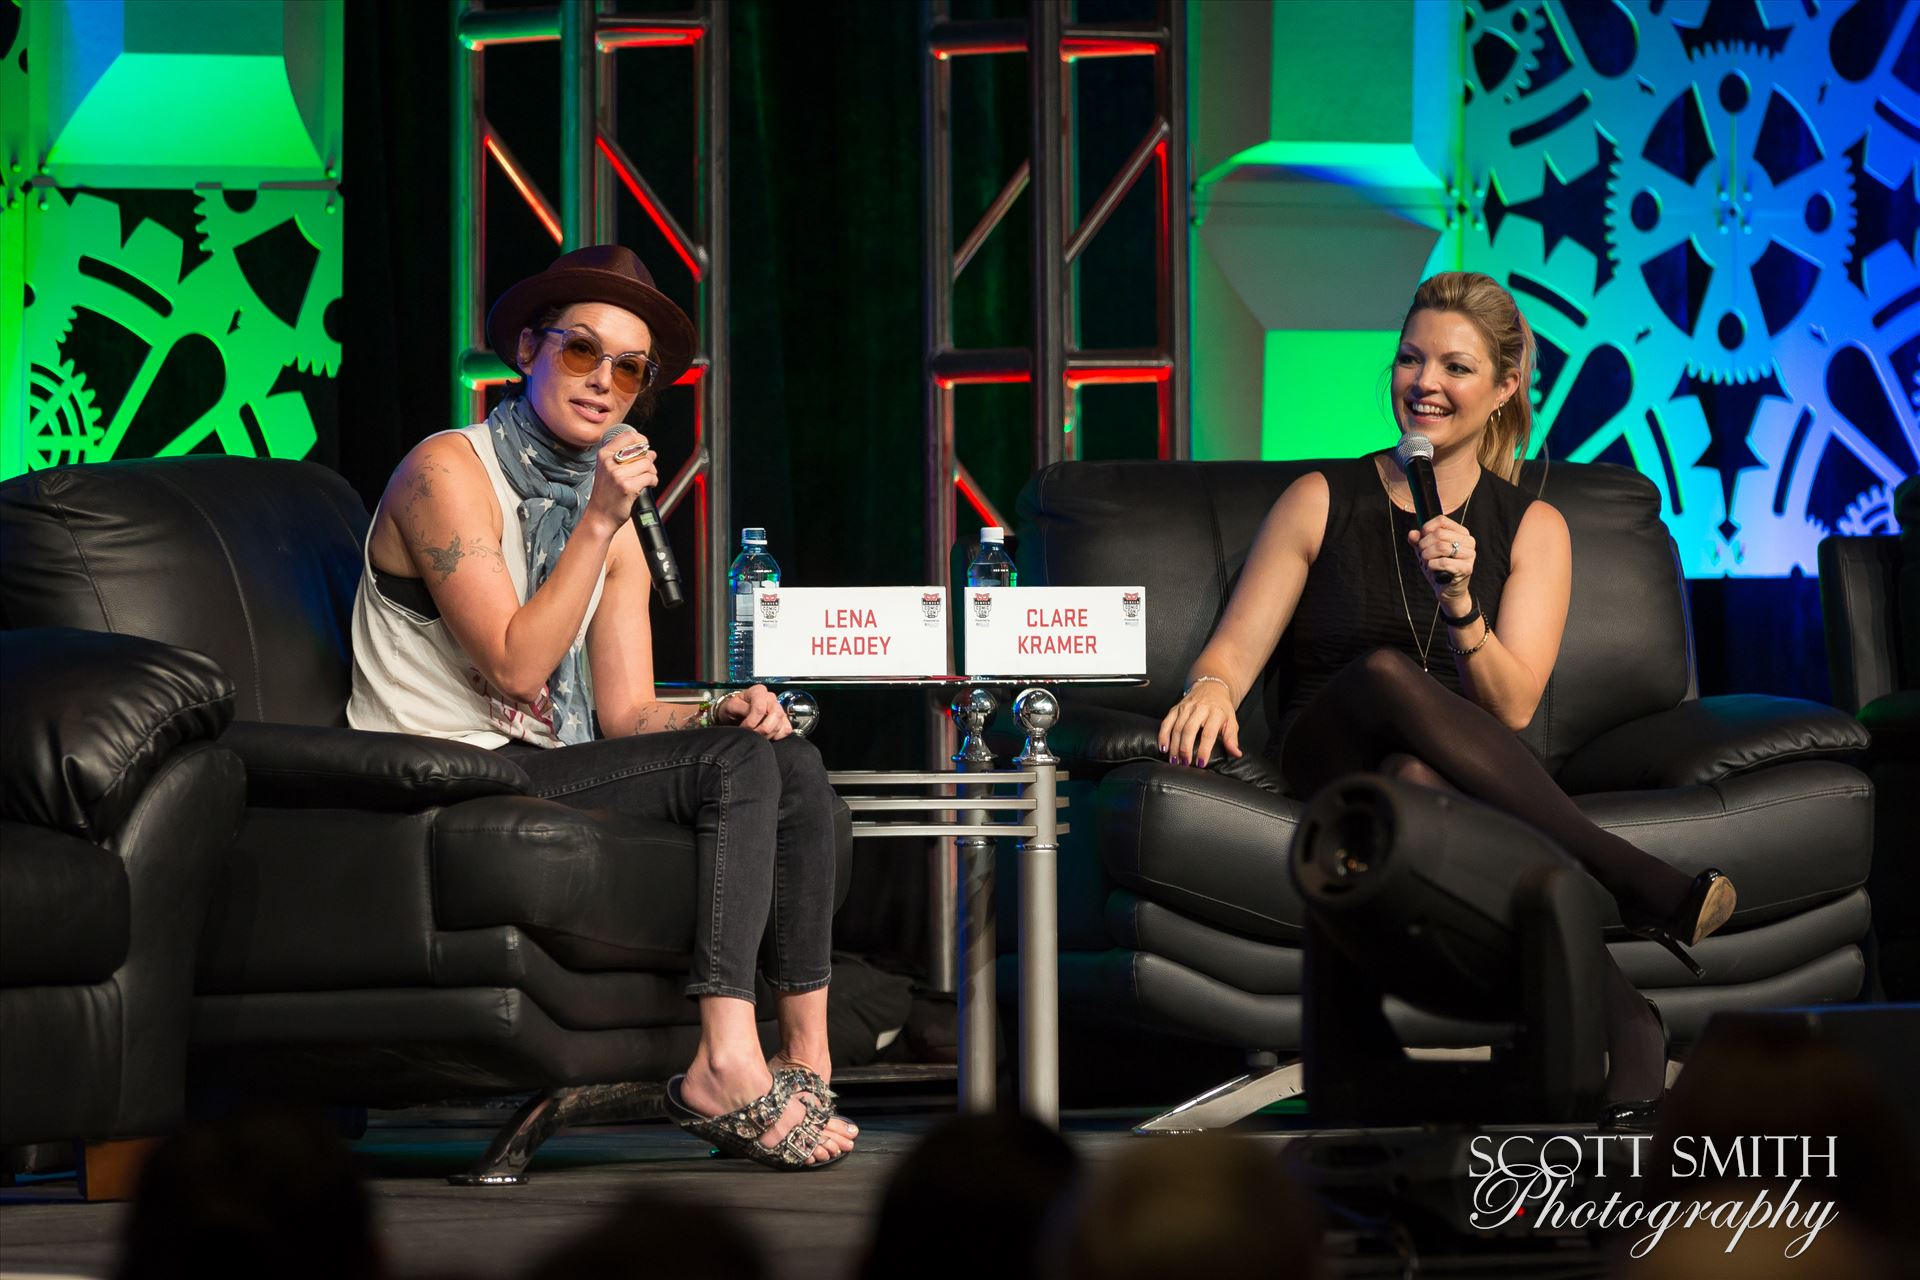 Denver Comic Con 2016 06 - Denver Comic Con 2016 at the Colorado Convention Center. Clare Kramer and Lena Headey. by D Scott Smith